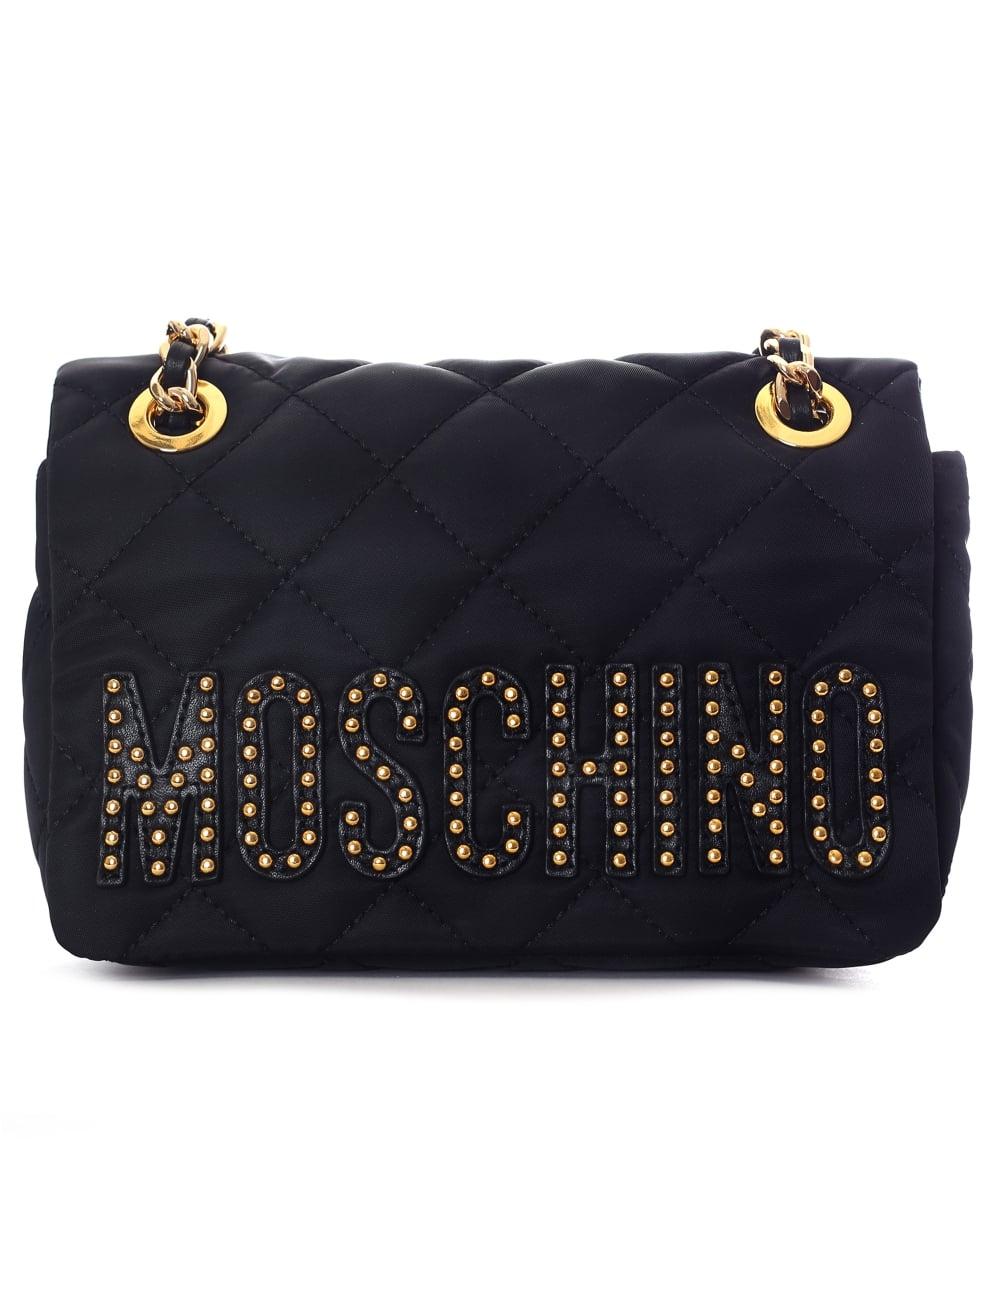 Moschino Studded shoulder bag sOK8n2ci